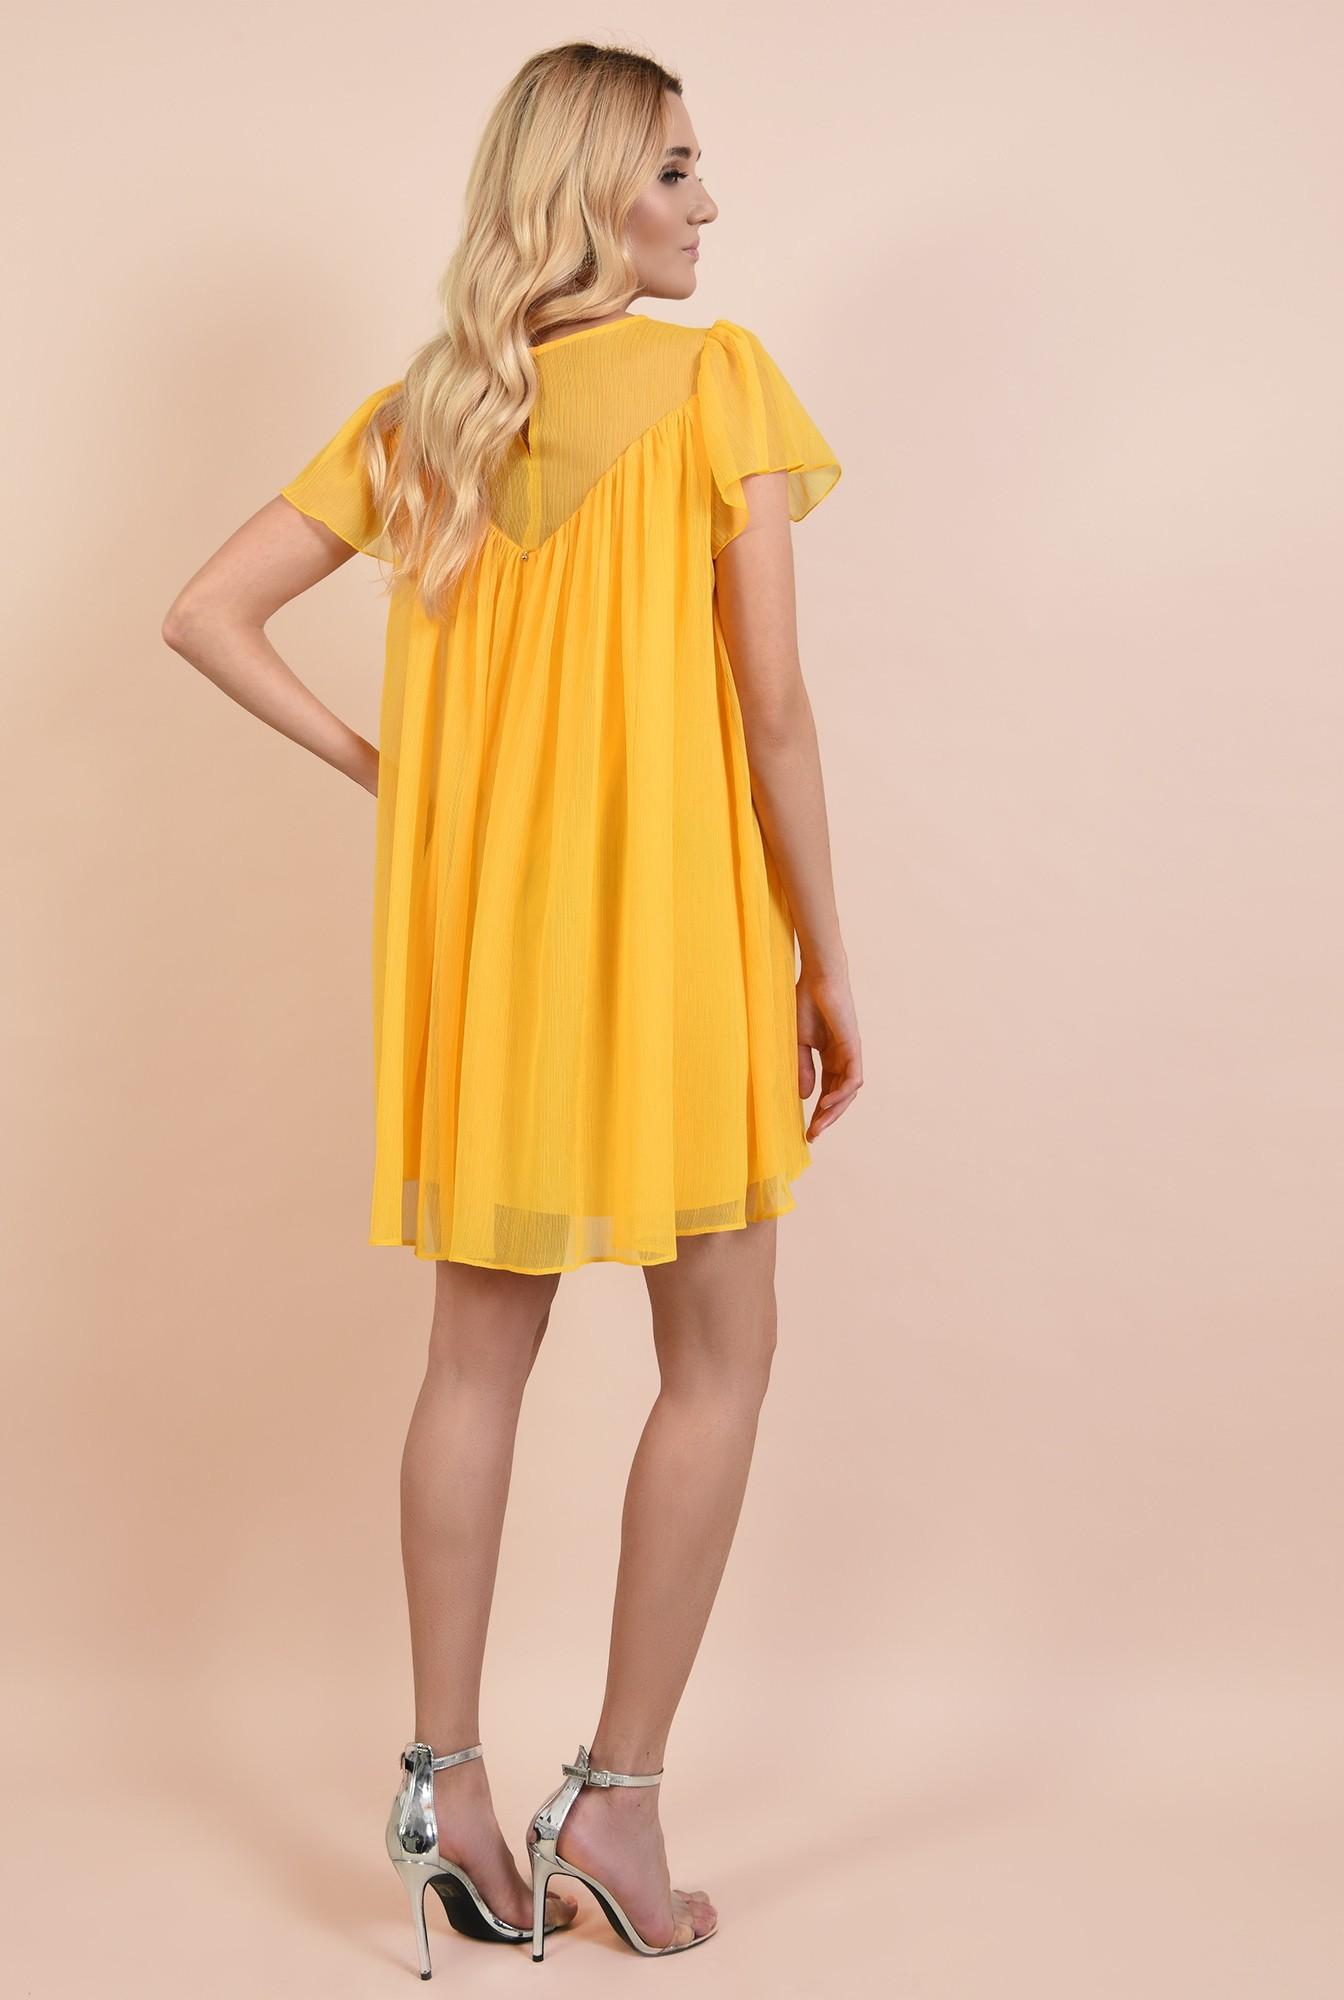 1 - rochie eleganta din voal, rochii online, croi lejer, scurta, maneci evazate